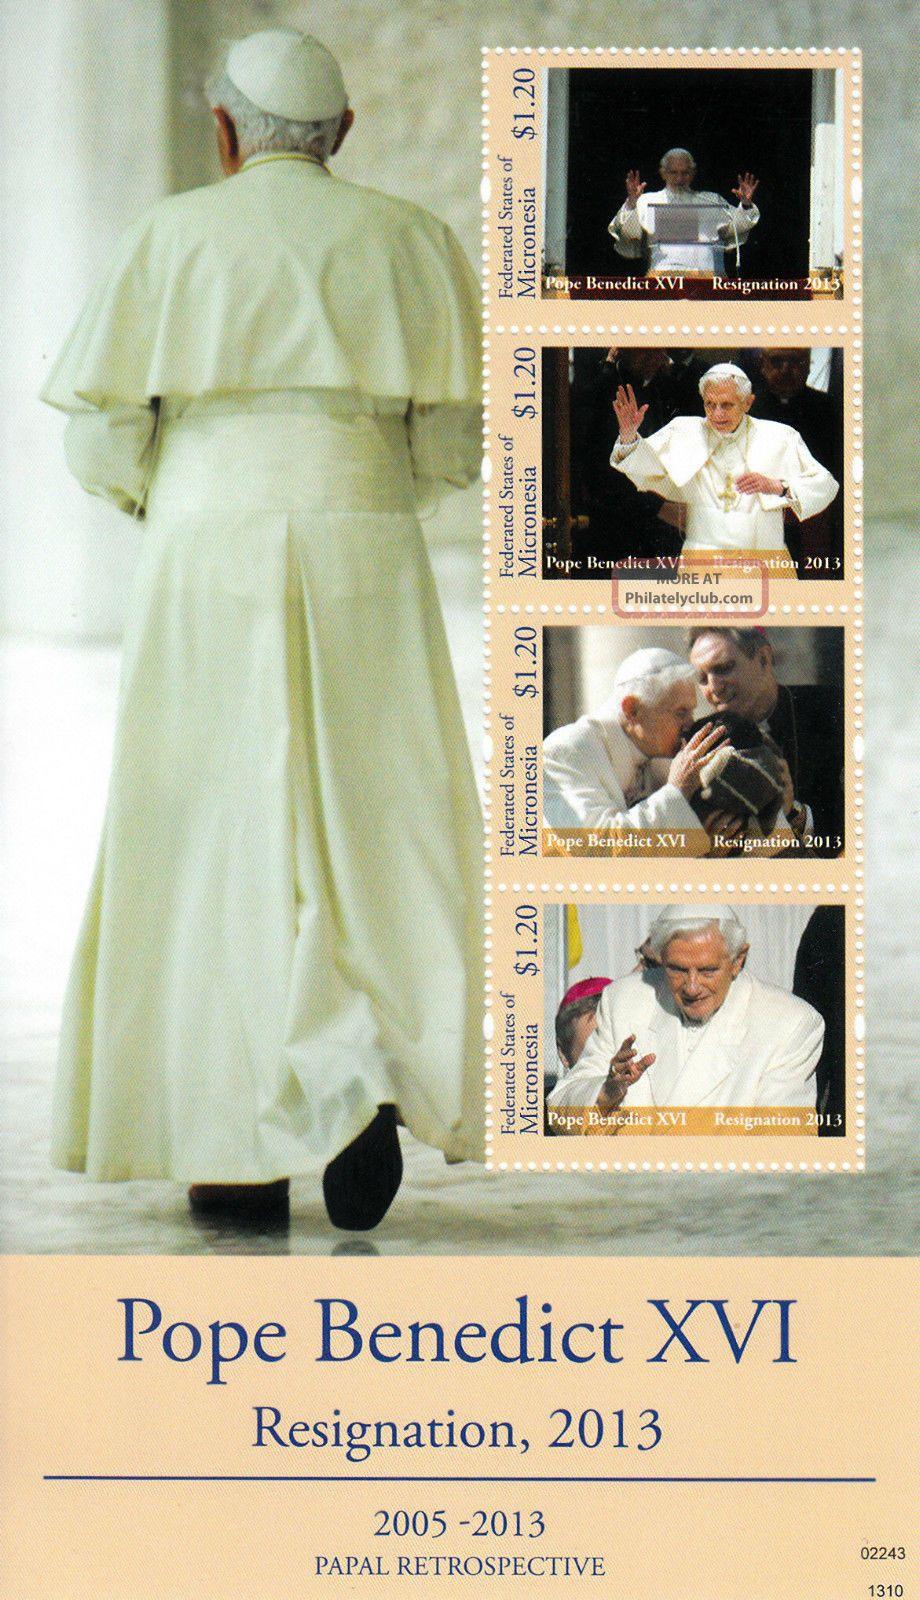 Micronesia 2013 Papal Retrospective Pope Benedict Xvi Resignation I 4v M/s Australia & Oceania photo